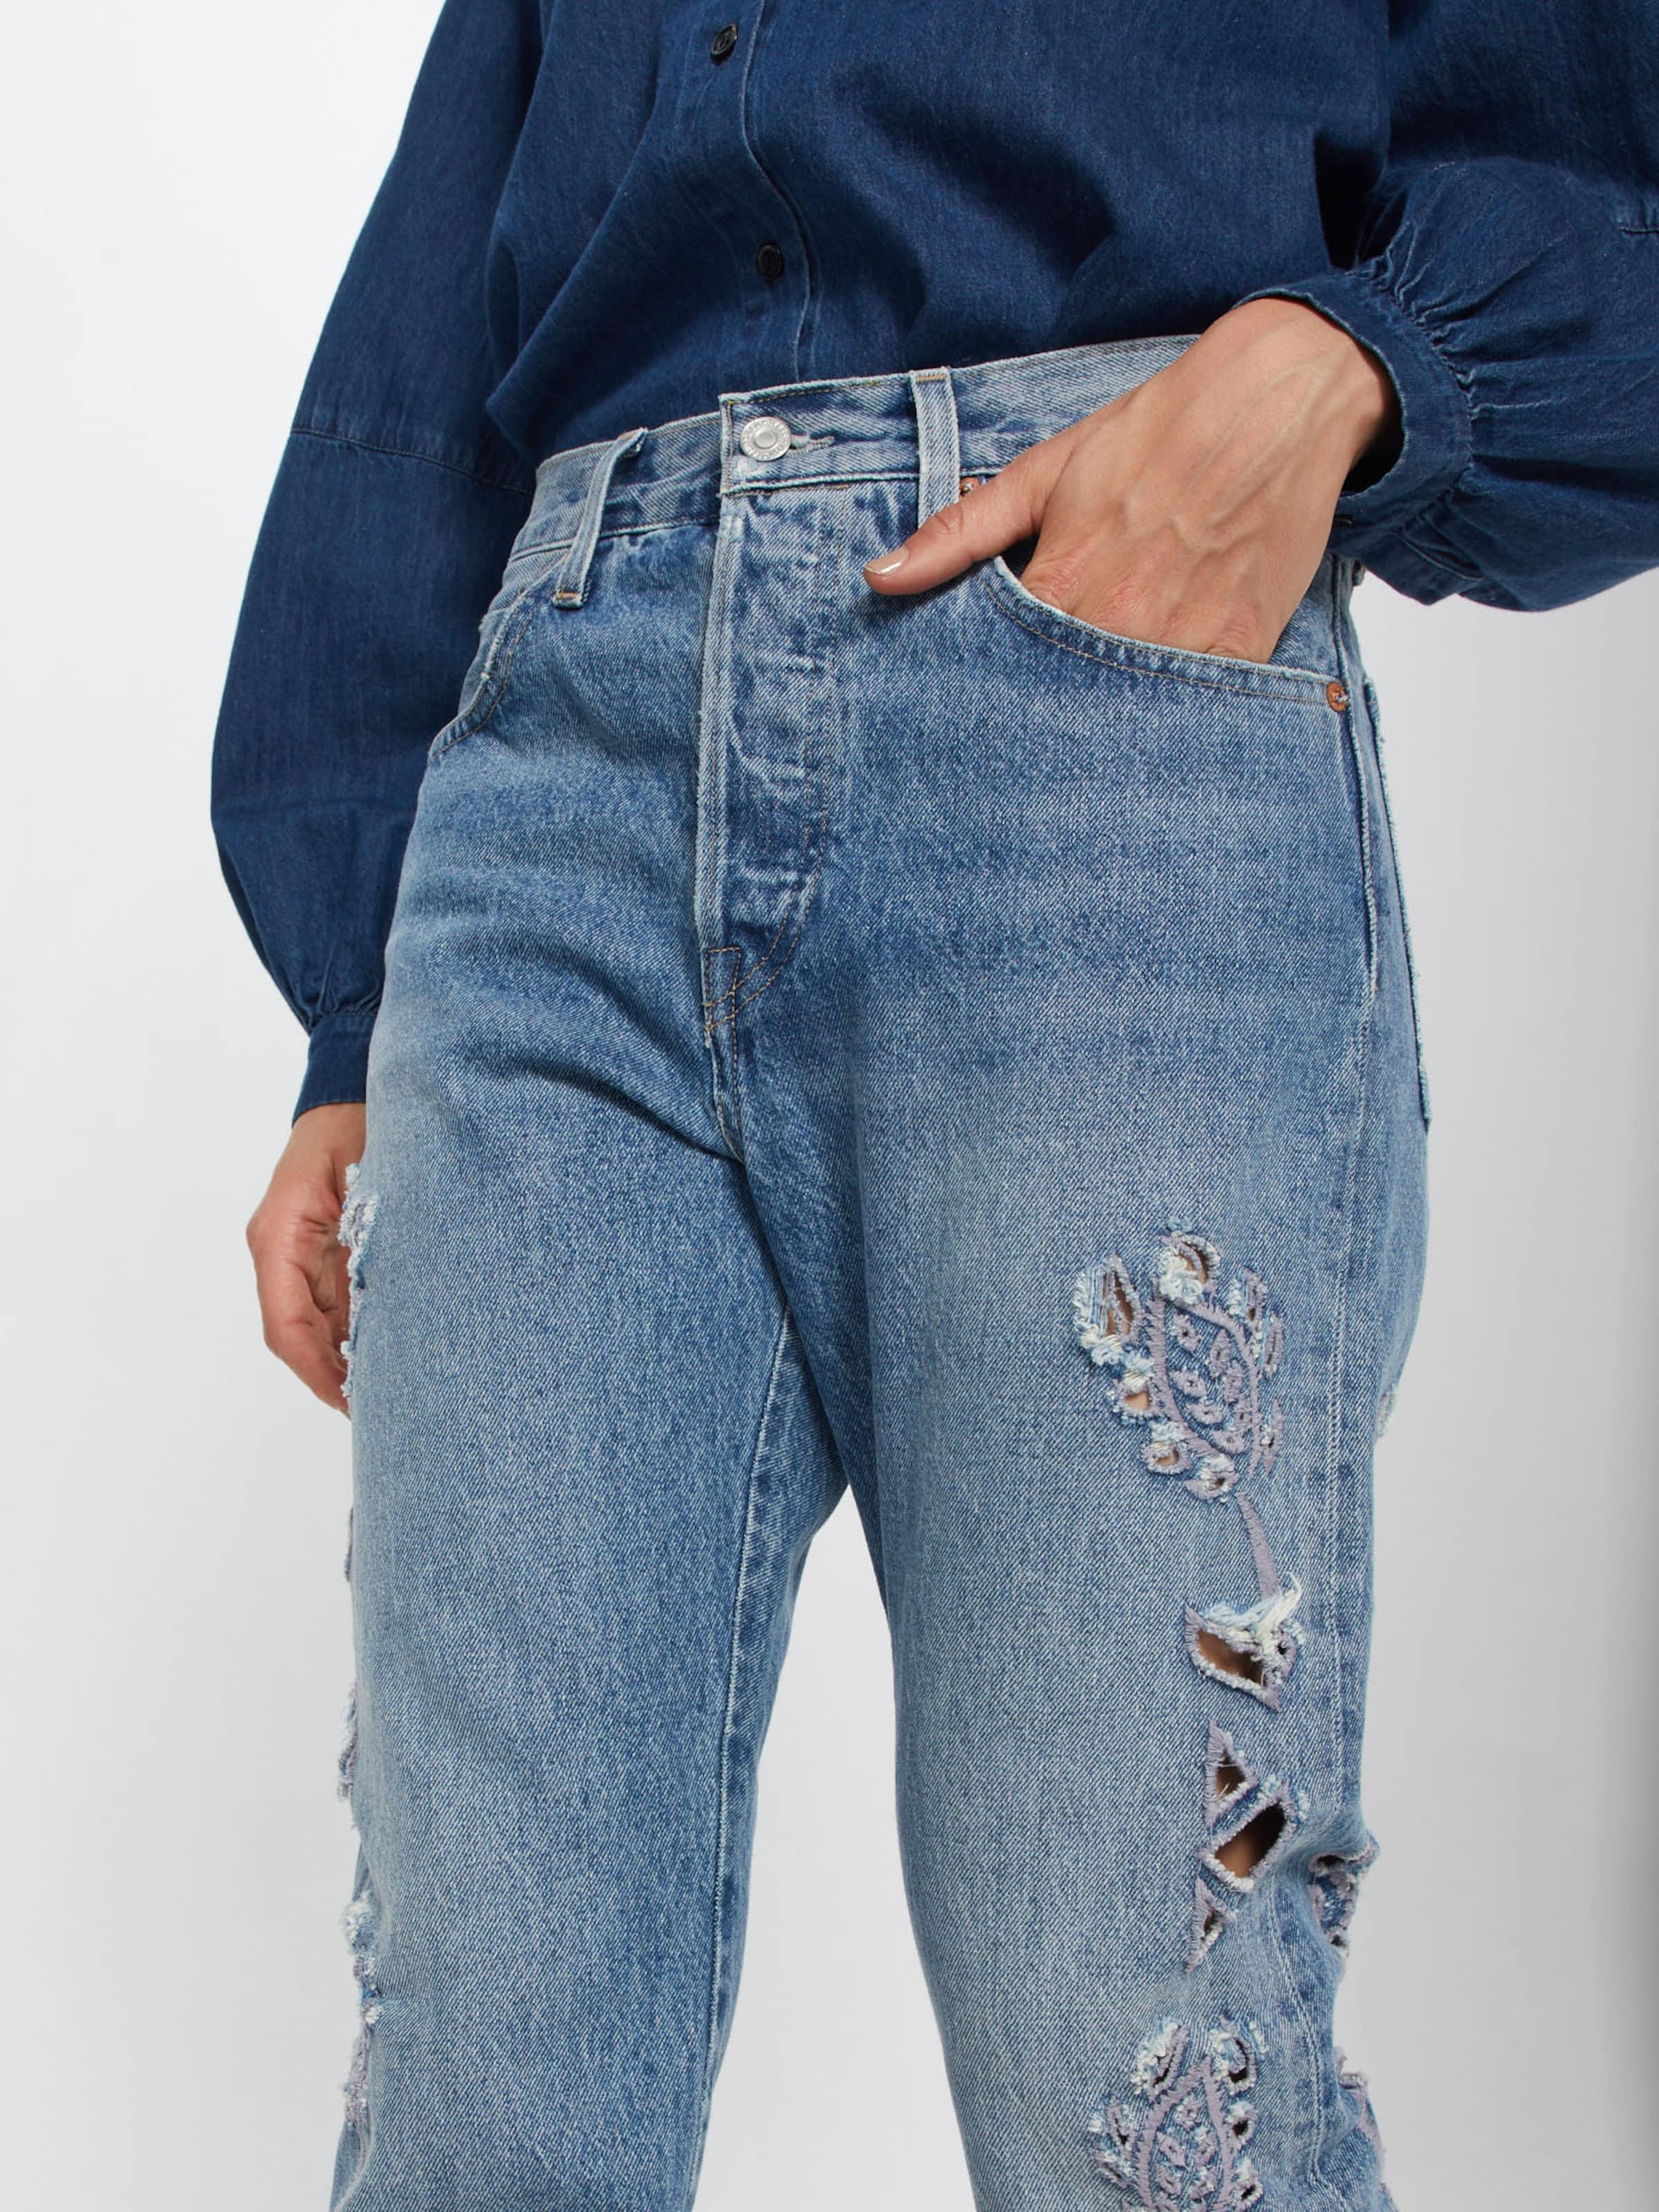 Madeamp; In Denim Levi's Crafted Blue Jeans qMVGSUzp